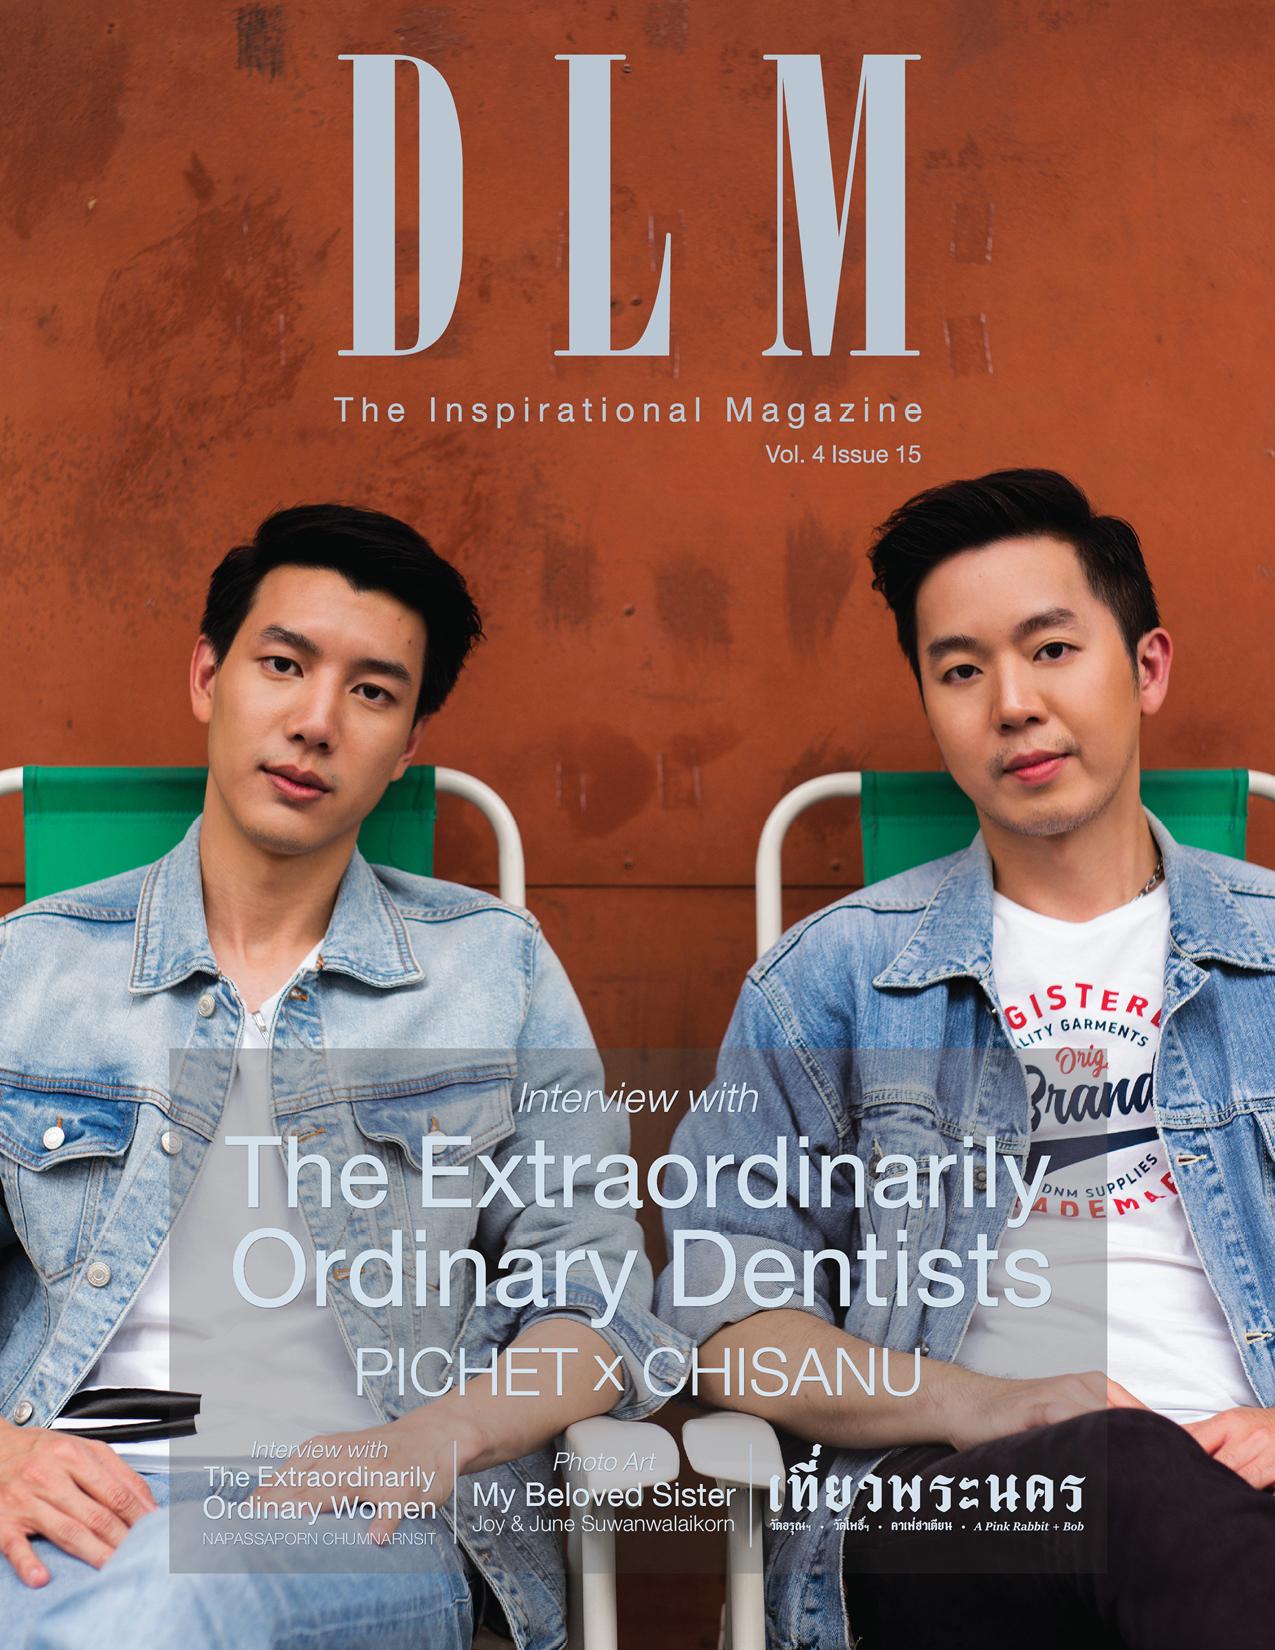 Magazine DLM Issue 13